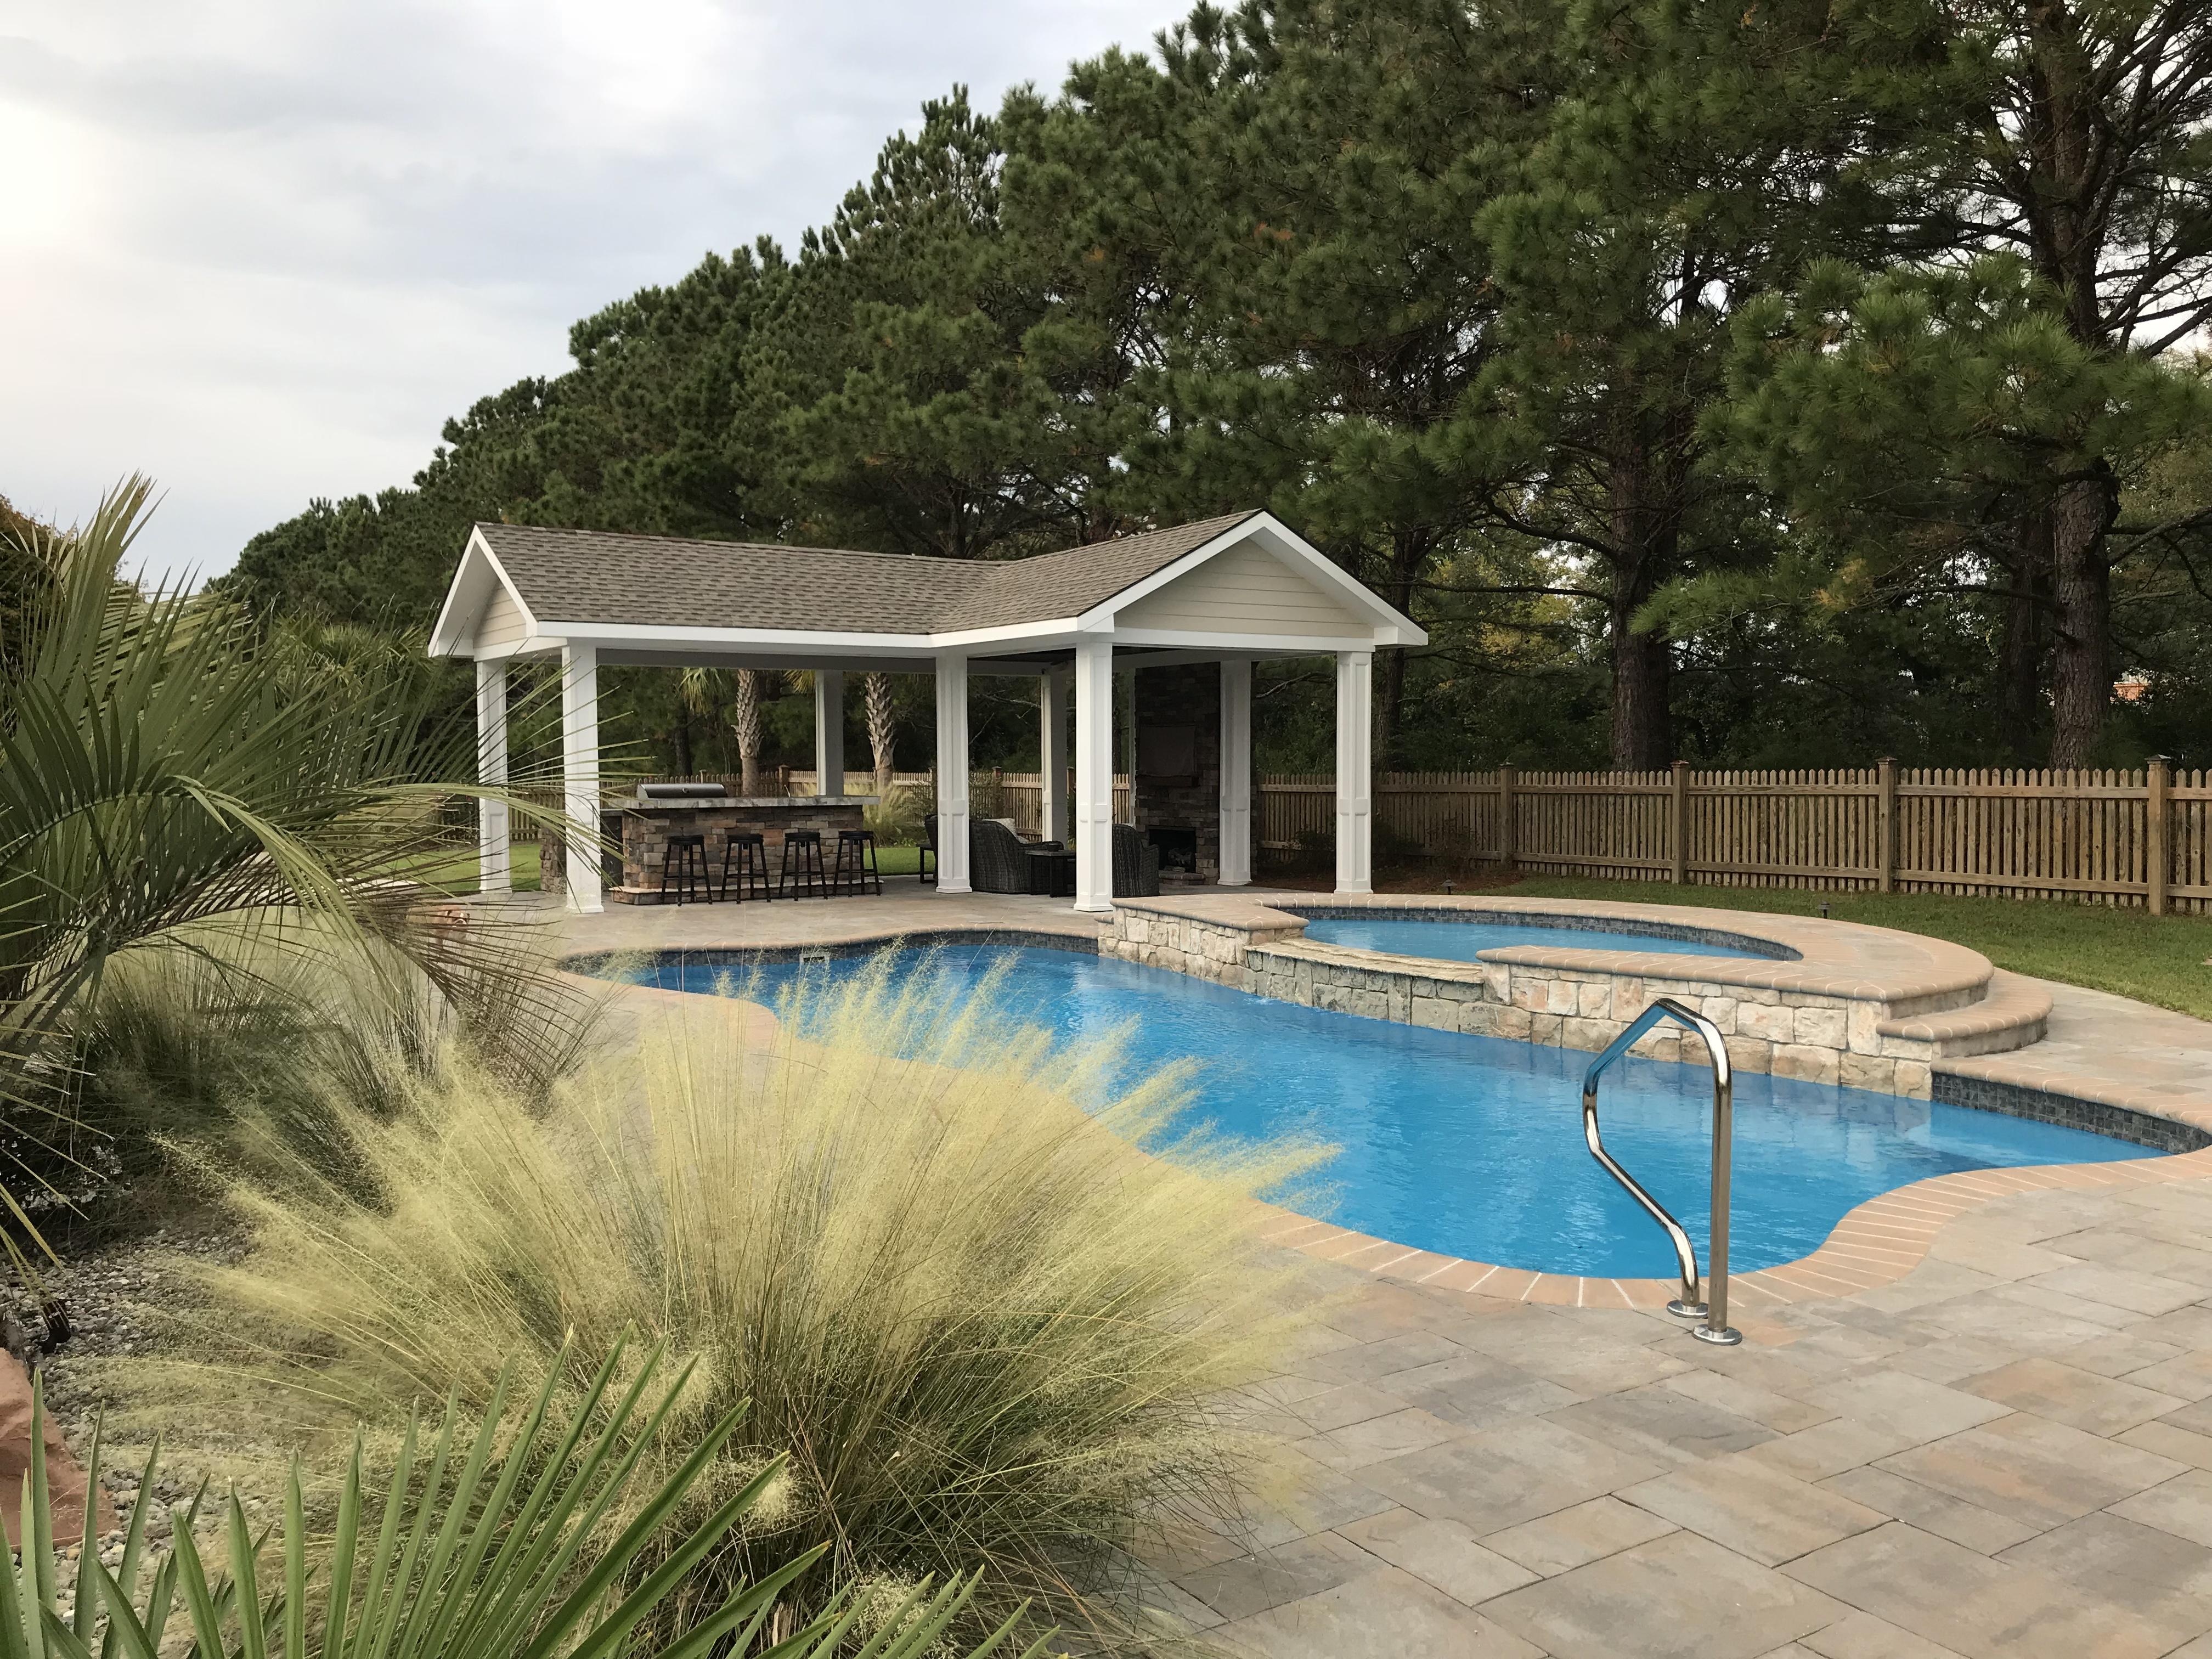 Ocean Blue Pools & Spas reviews | Swimming Pools at 30 Covil ...